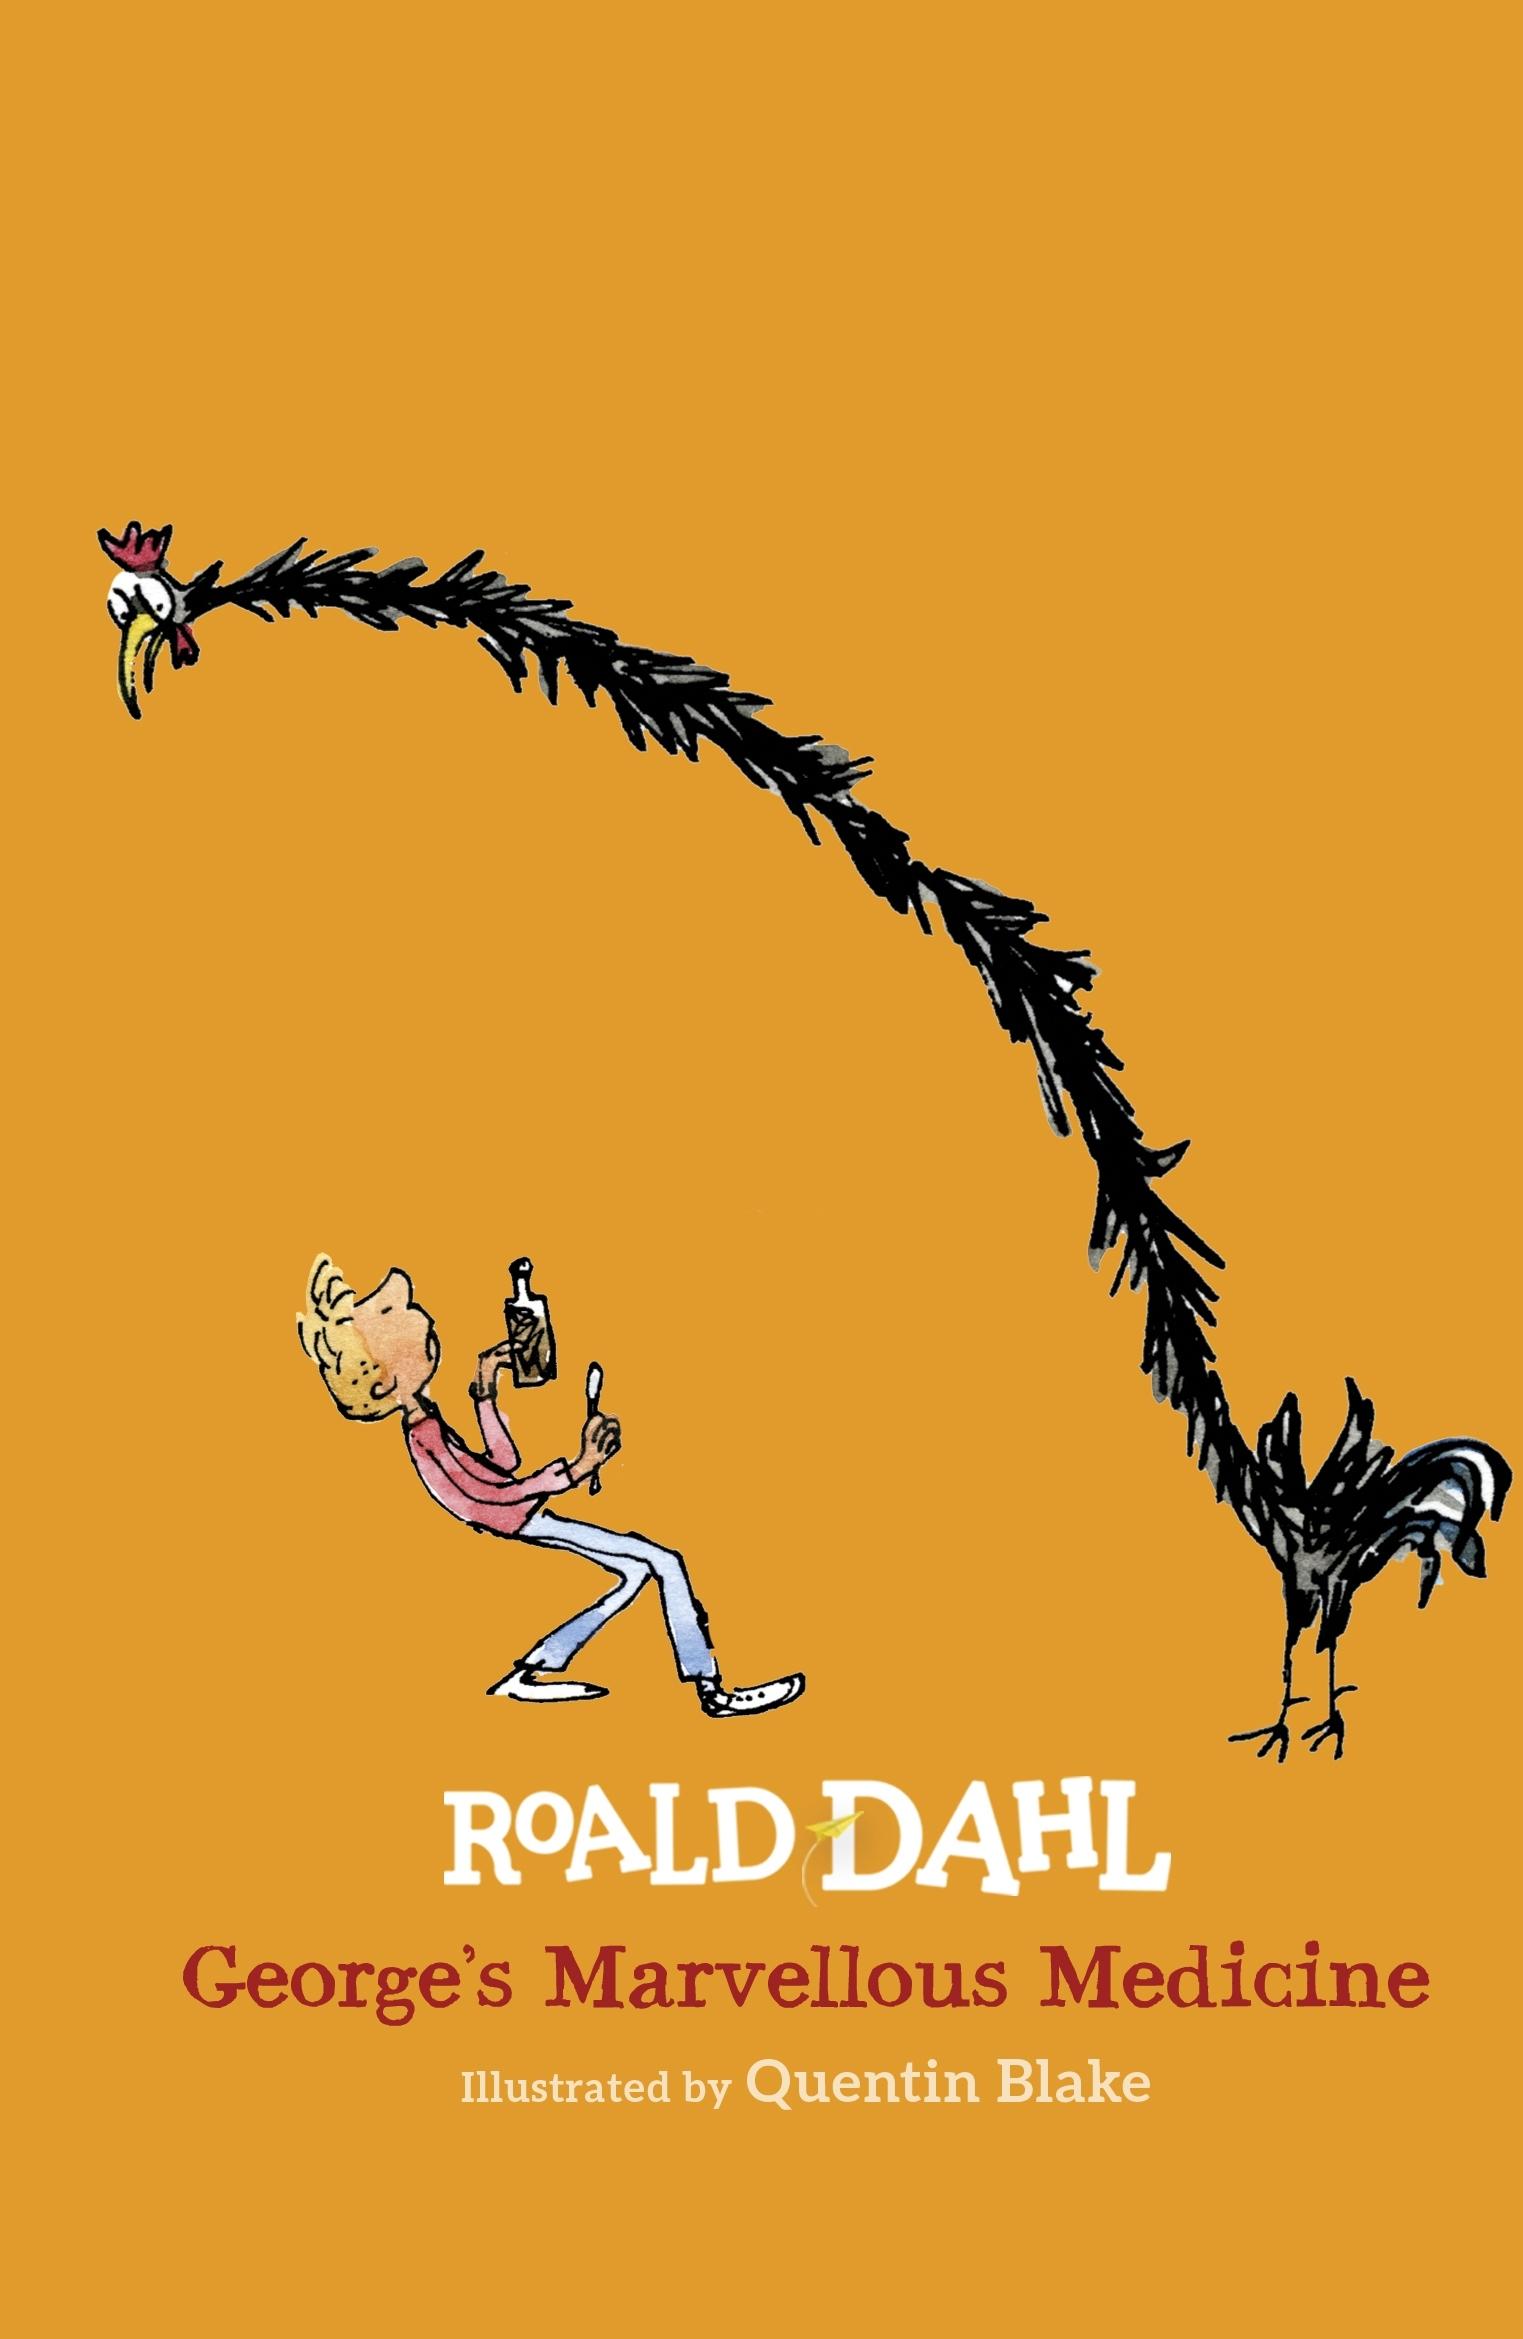 George's Marvellous Medicine by Roald Dahl - Penguin Books